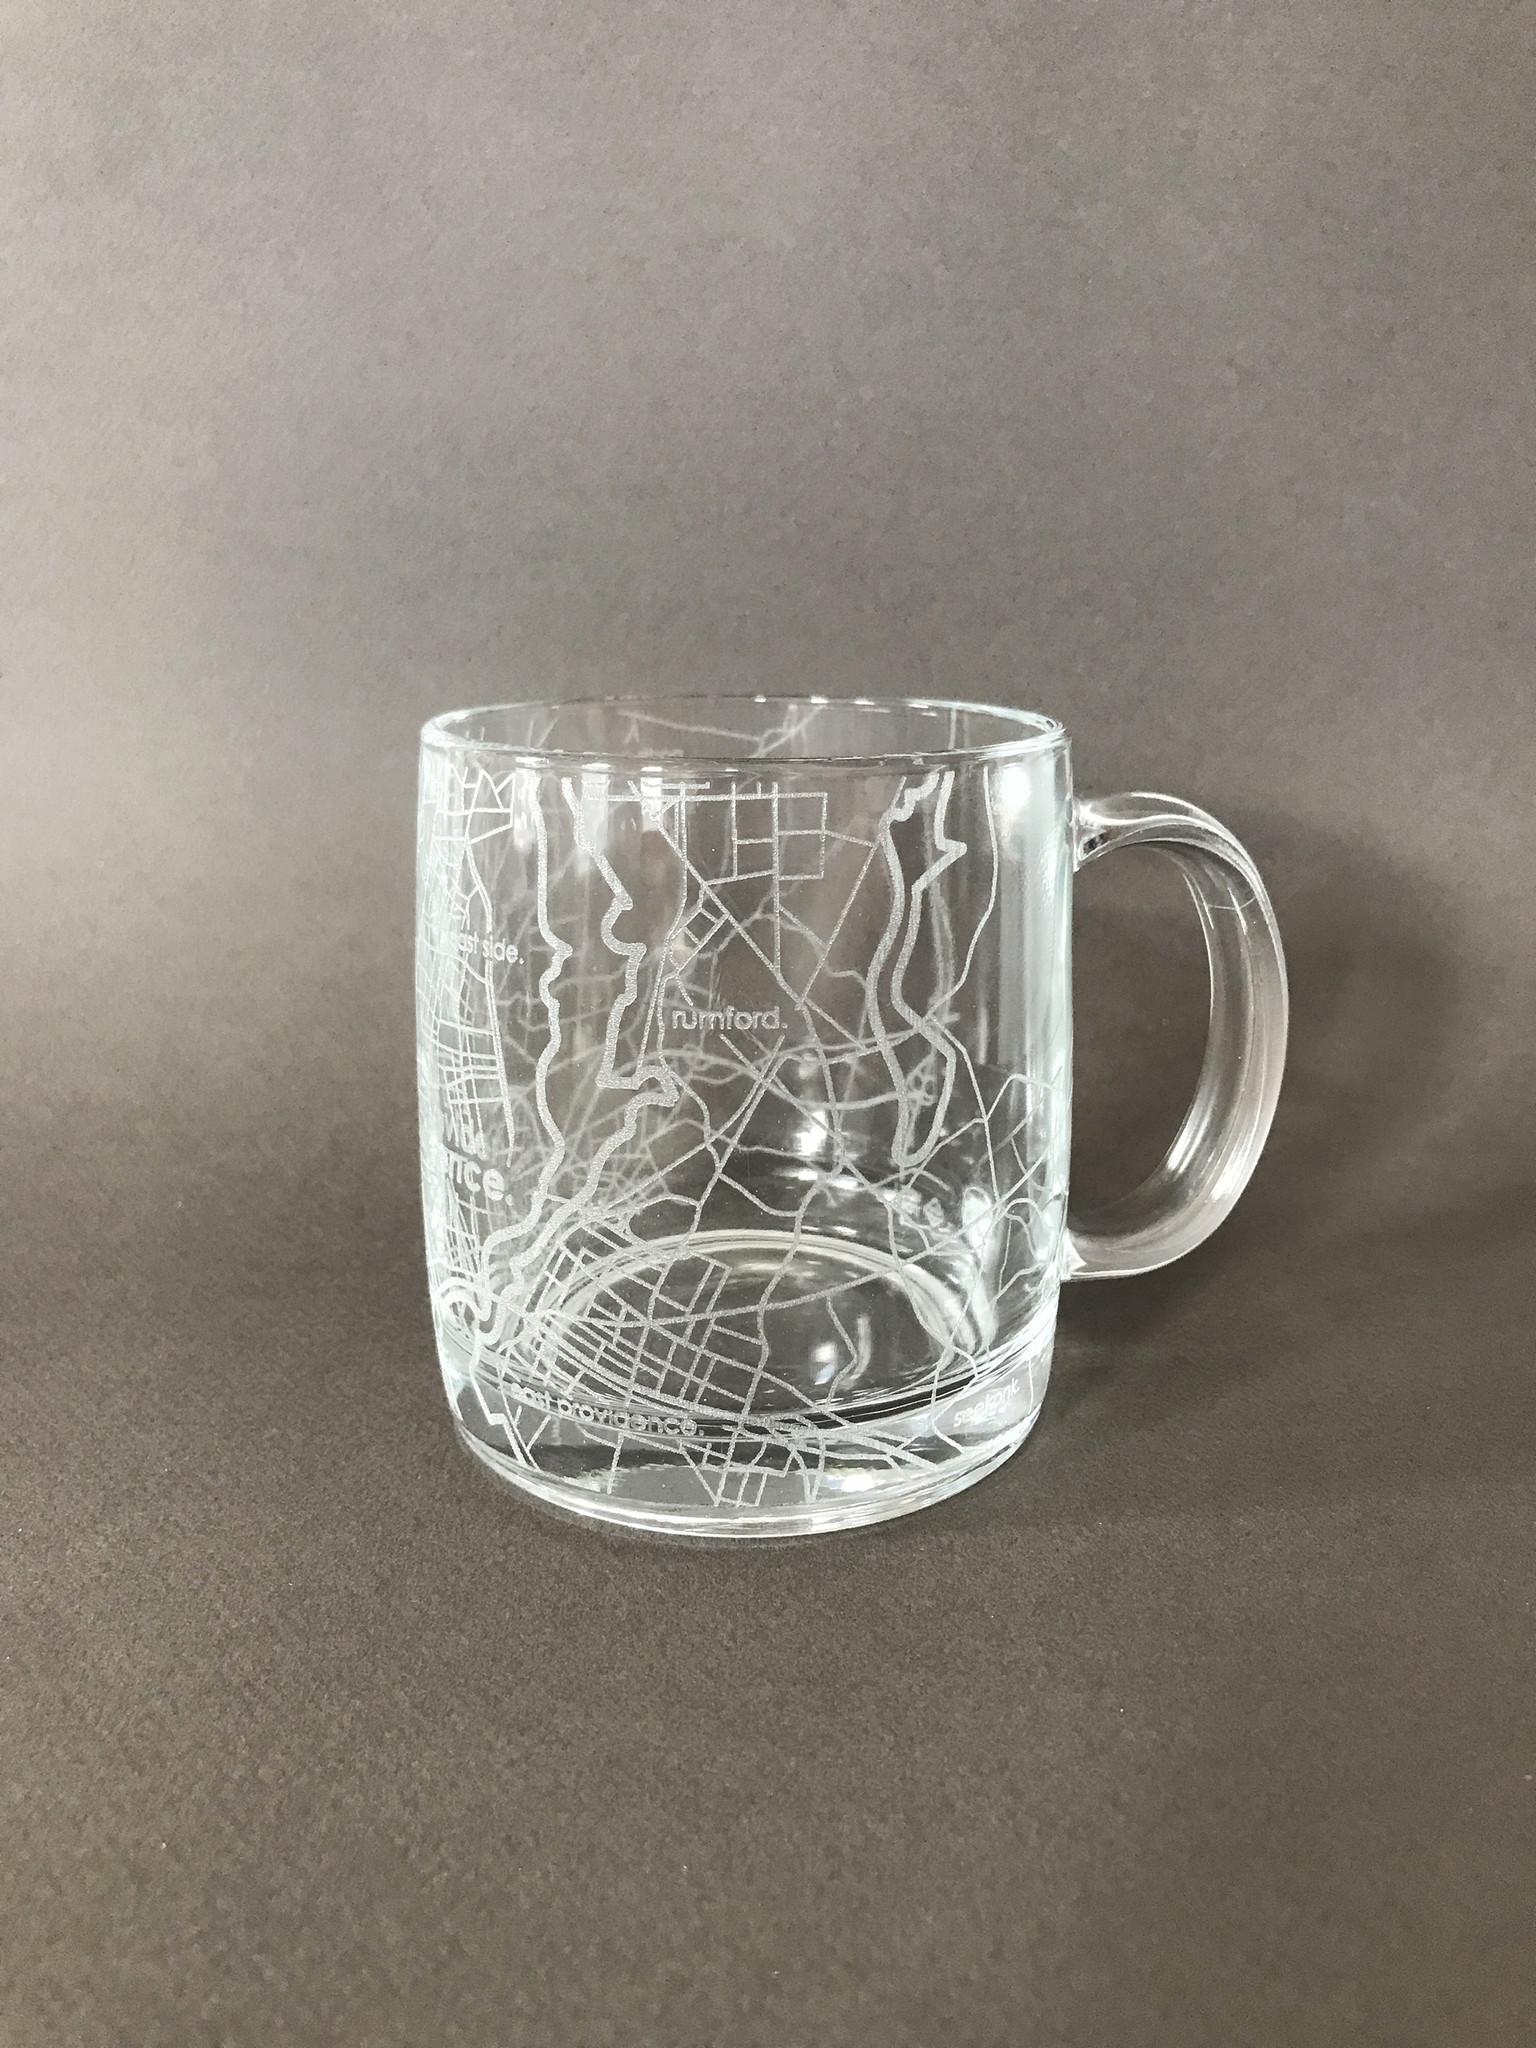 Well Told Hometown Providence Glass Handled Coffee Mug-2